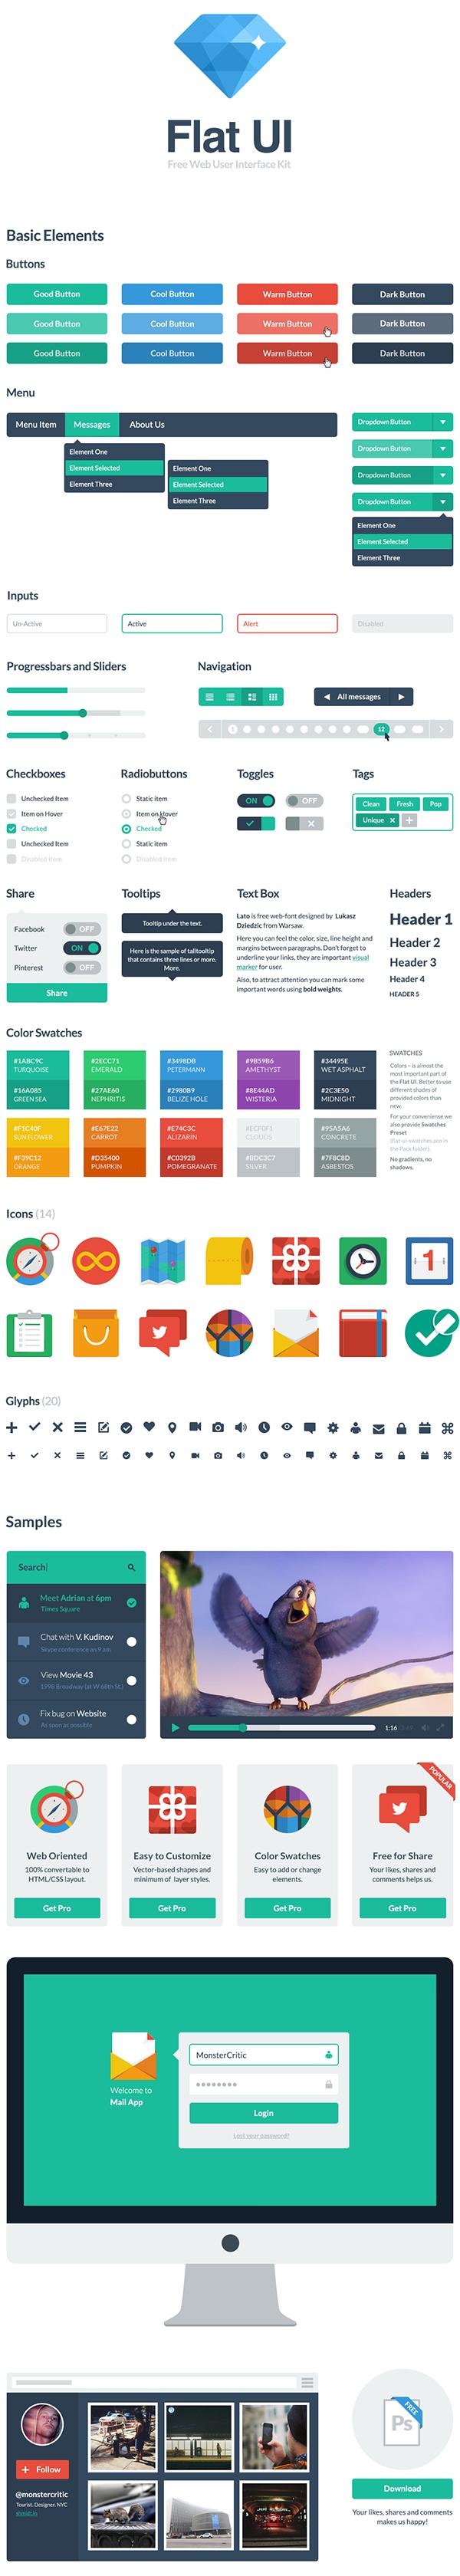 Flat UI – Free Bootstrap Theme